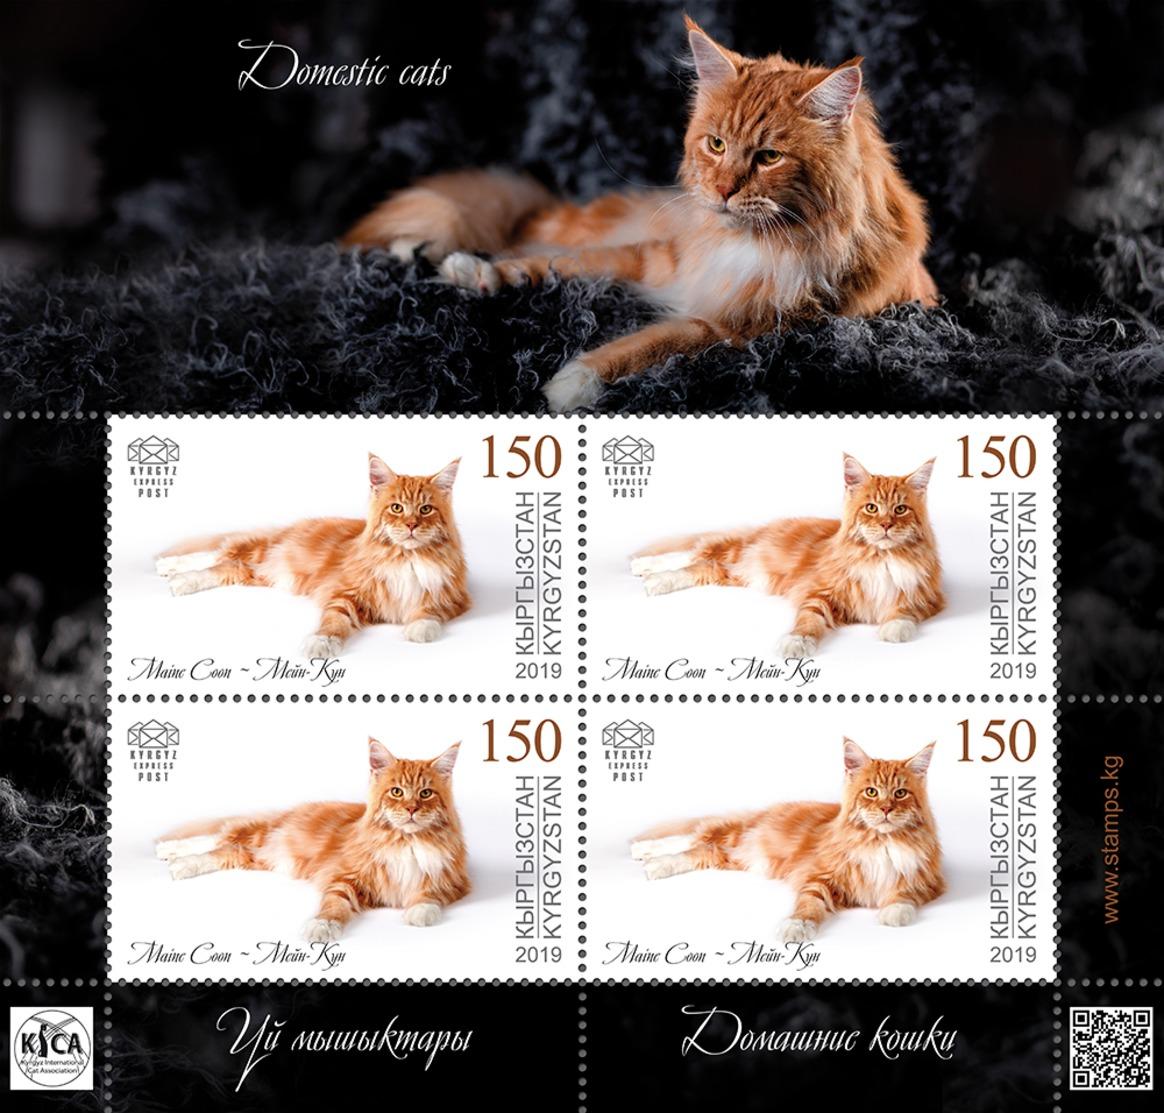 H01 Kyrgyzstan 2019 Mi# 127 Cats Katzen Mini Sheet MNH Postfrisch - Kirghizistan